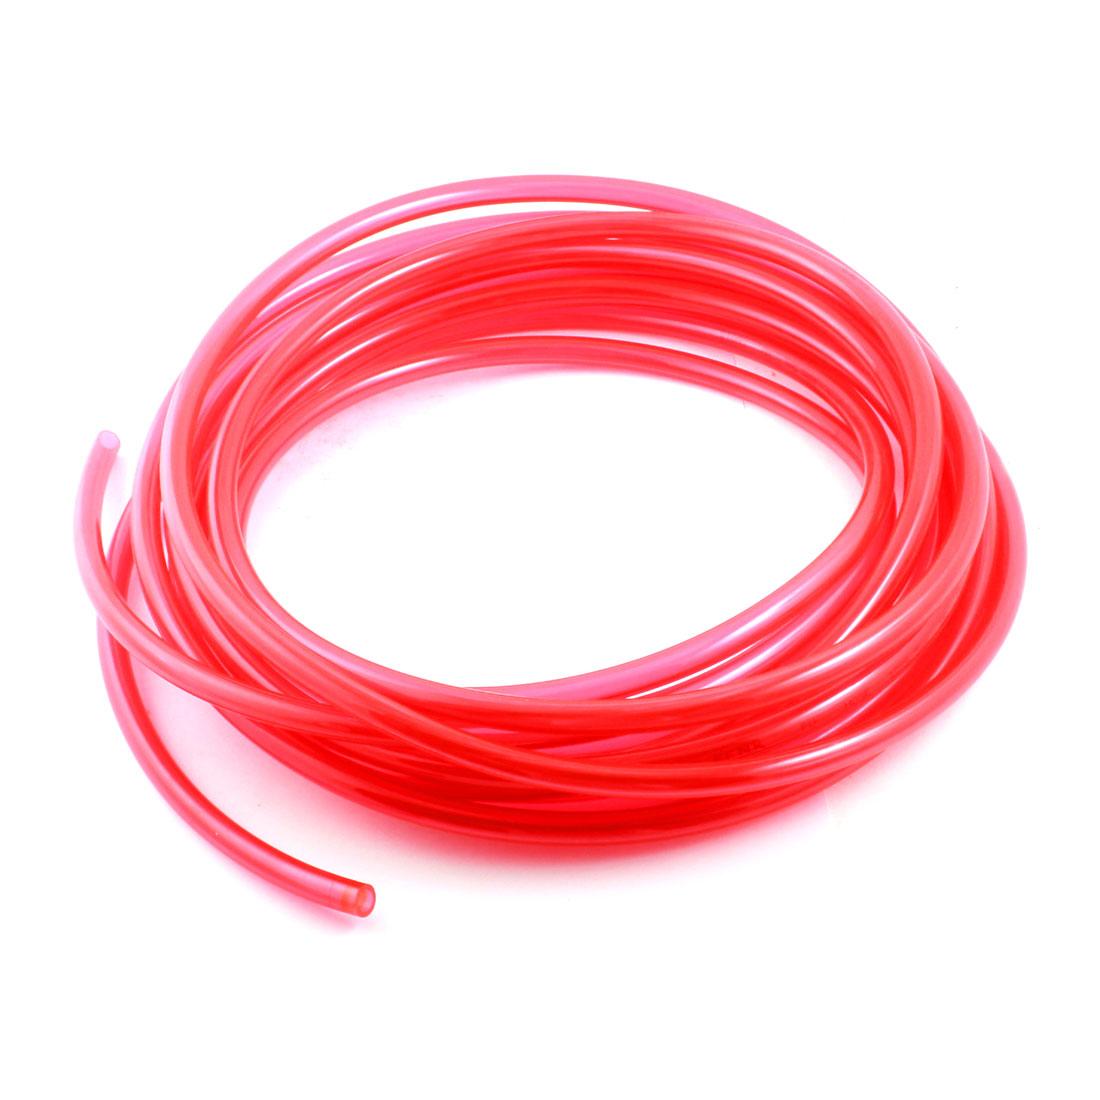 10Meters/33Ft Long 6.5x10mm Fuel Gas Petrol Diesel Water Flexible Hose Air PU Tubing Pneumatic Pipe Tube Clear Red